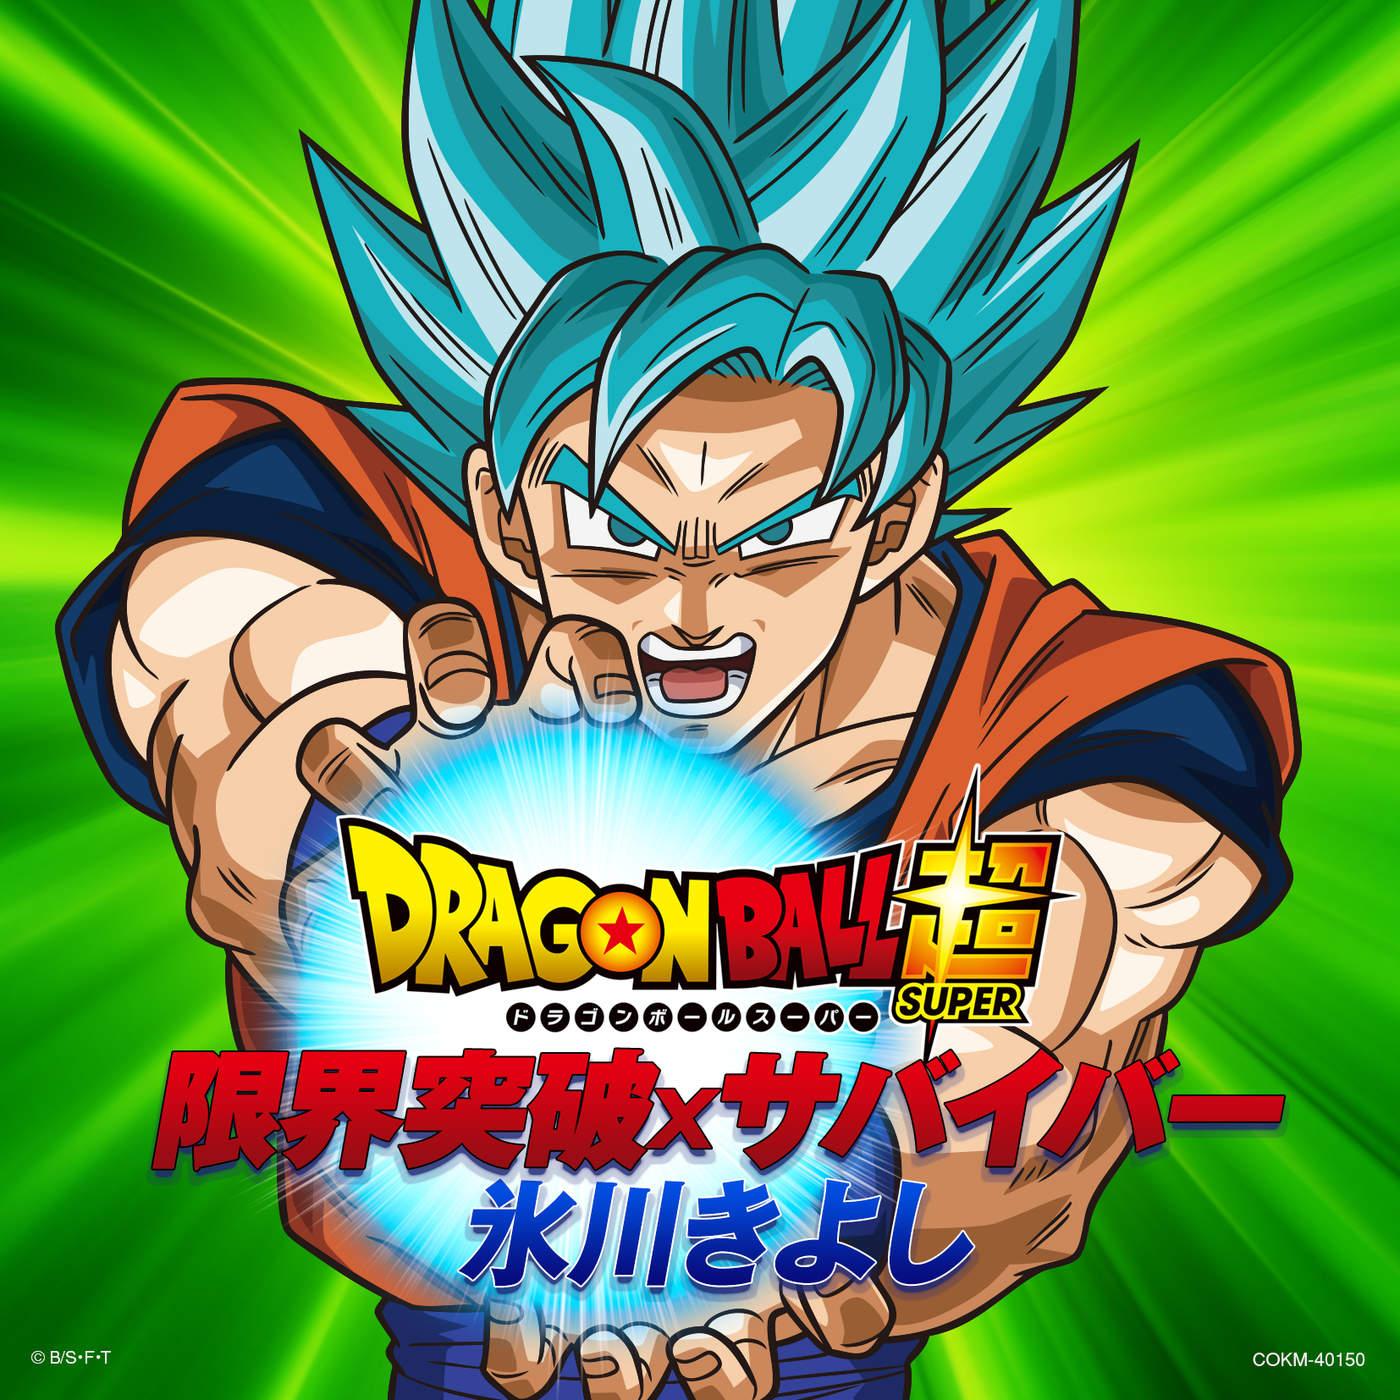 dragon ball z super episodes download torrent